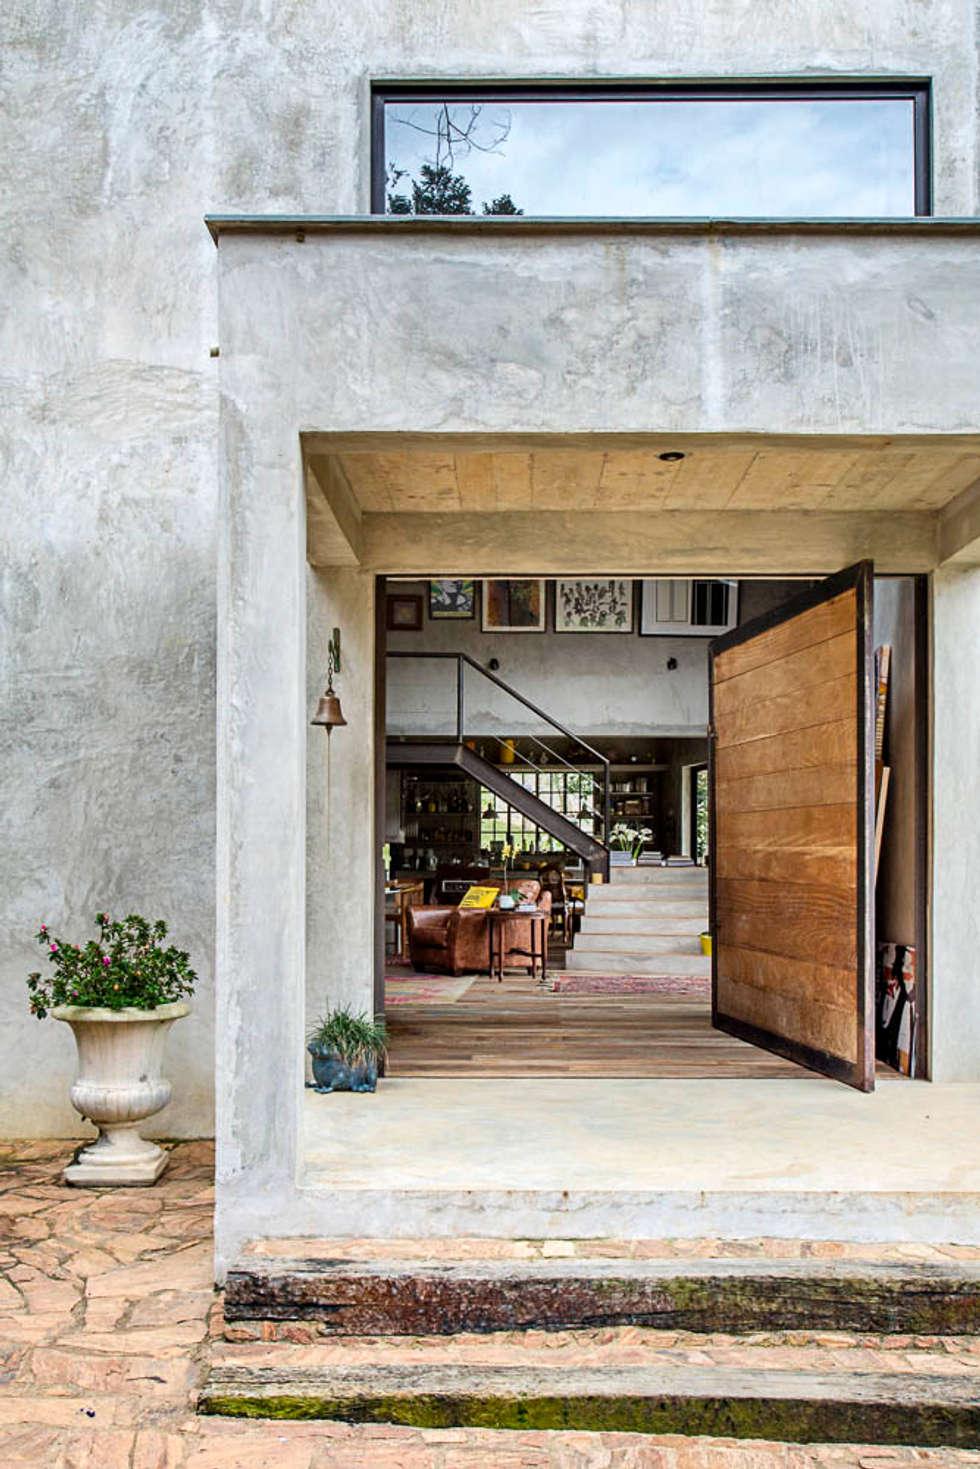 Fotos de decora o design de interiores e reformas homify - Interiores casa de campo ...